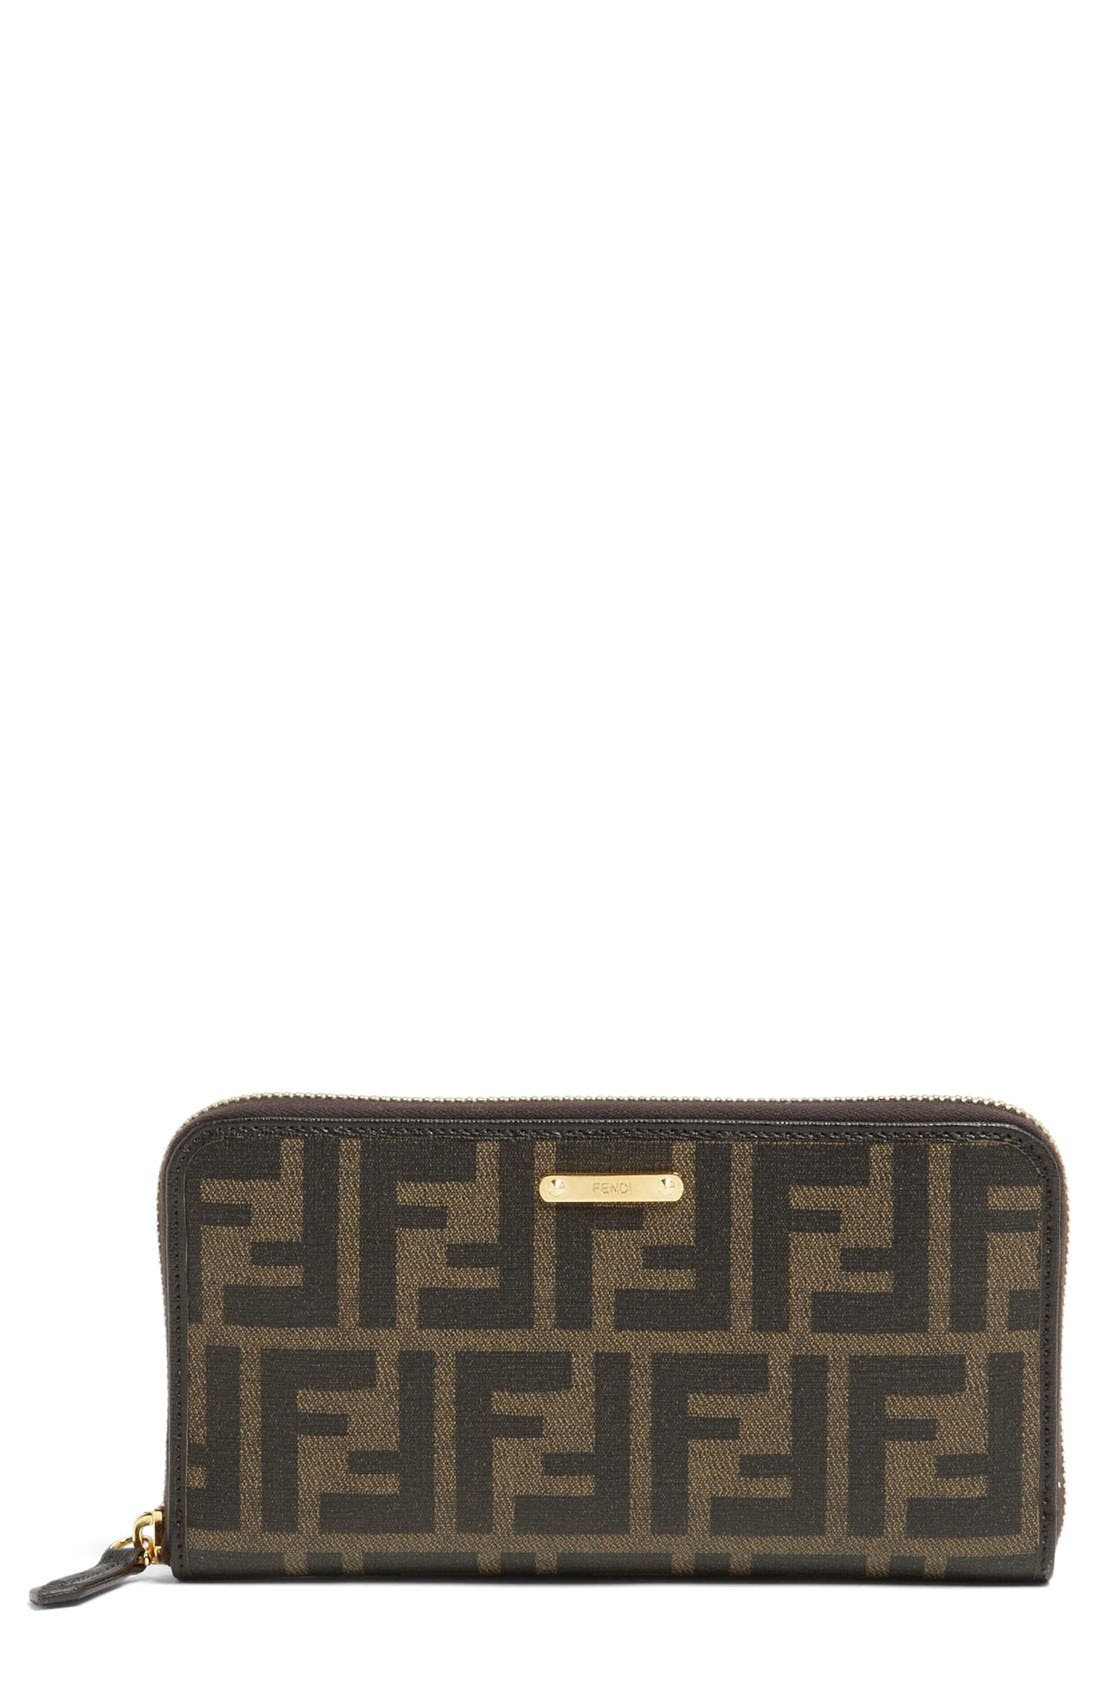 Main Image - Fendi 'Zucca' Wallet